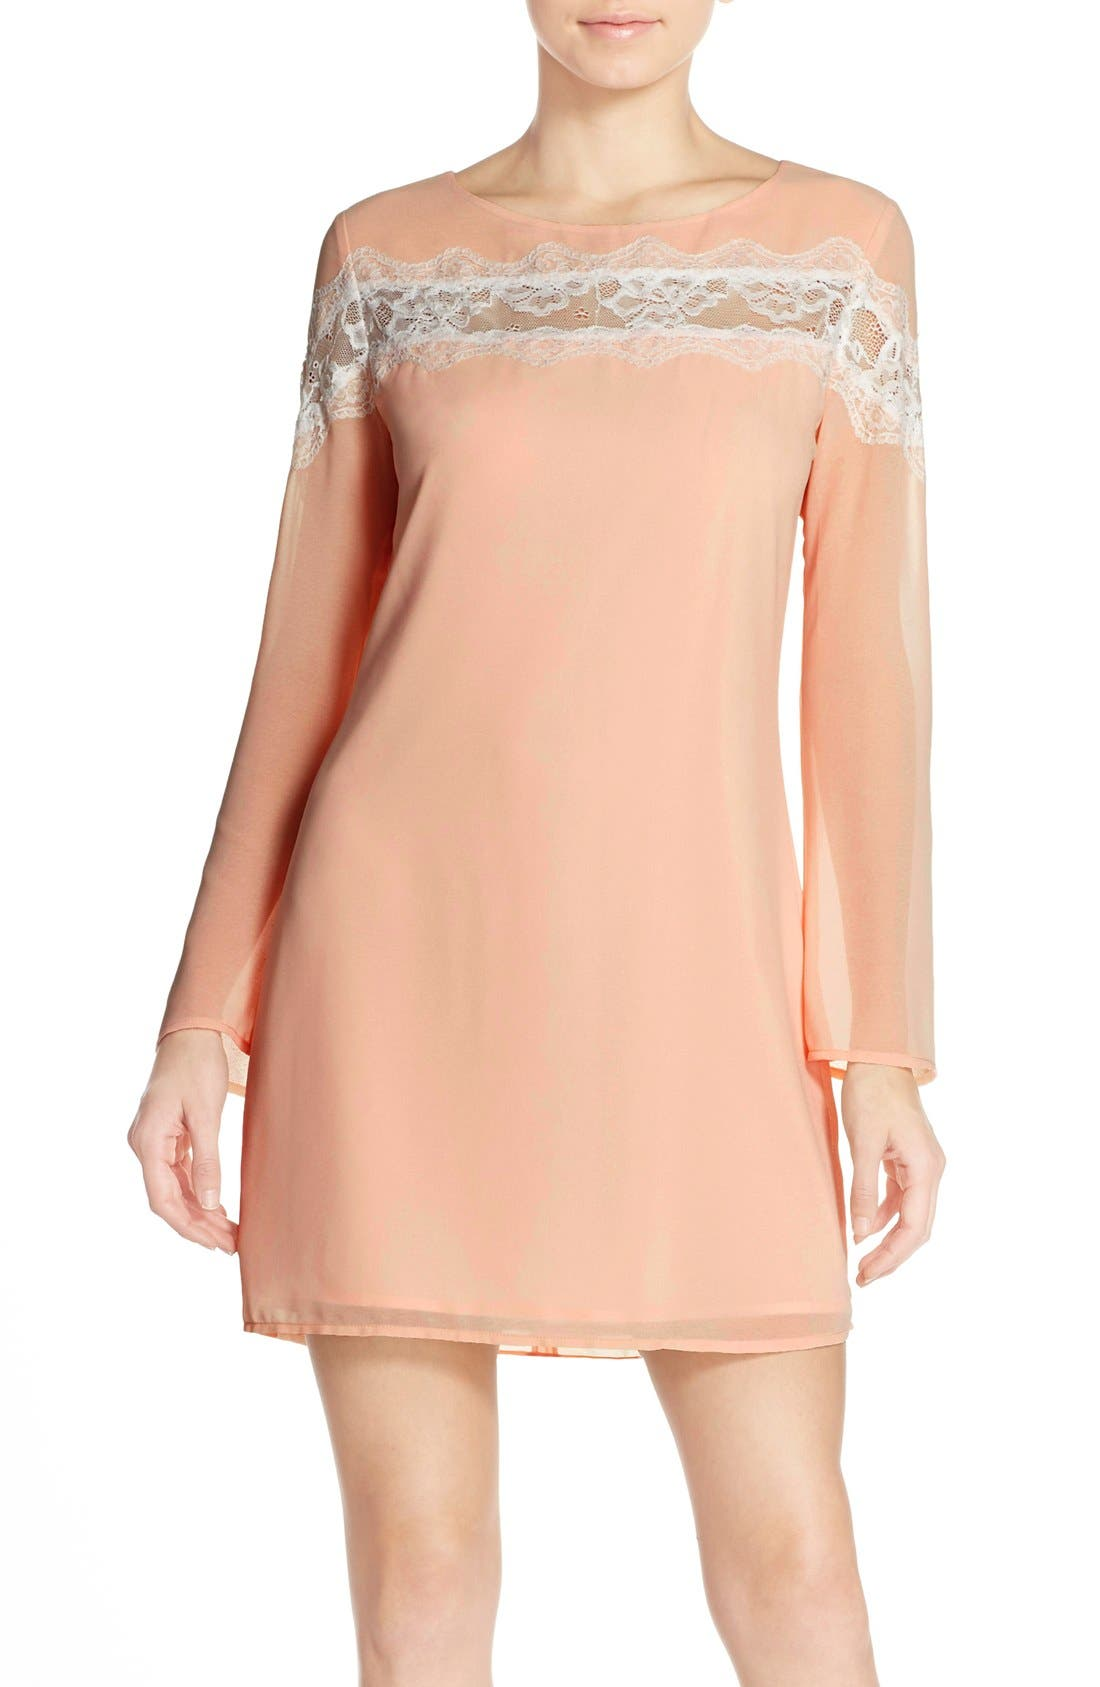 Alternate Image 1 Selected - Chelsea28 Lace Trim Chiffon Shift Dress